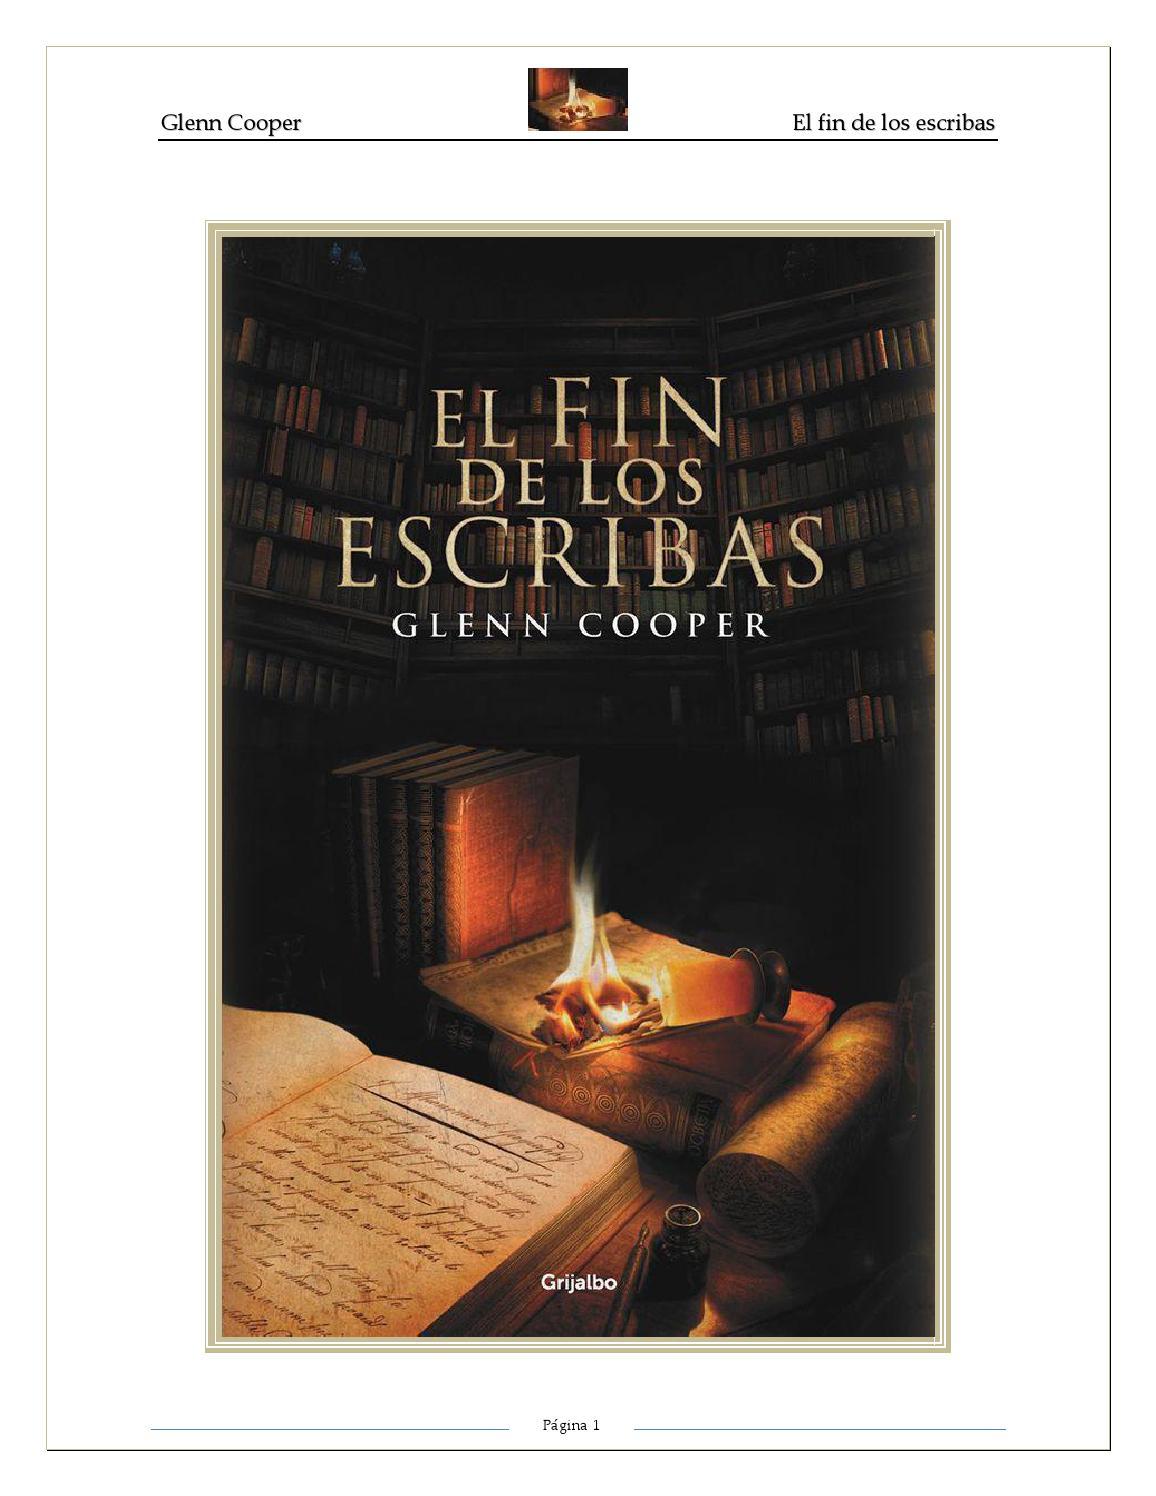 a424a1c63 Biblioteca de los muertos] 03 by EddyFle - issuu